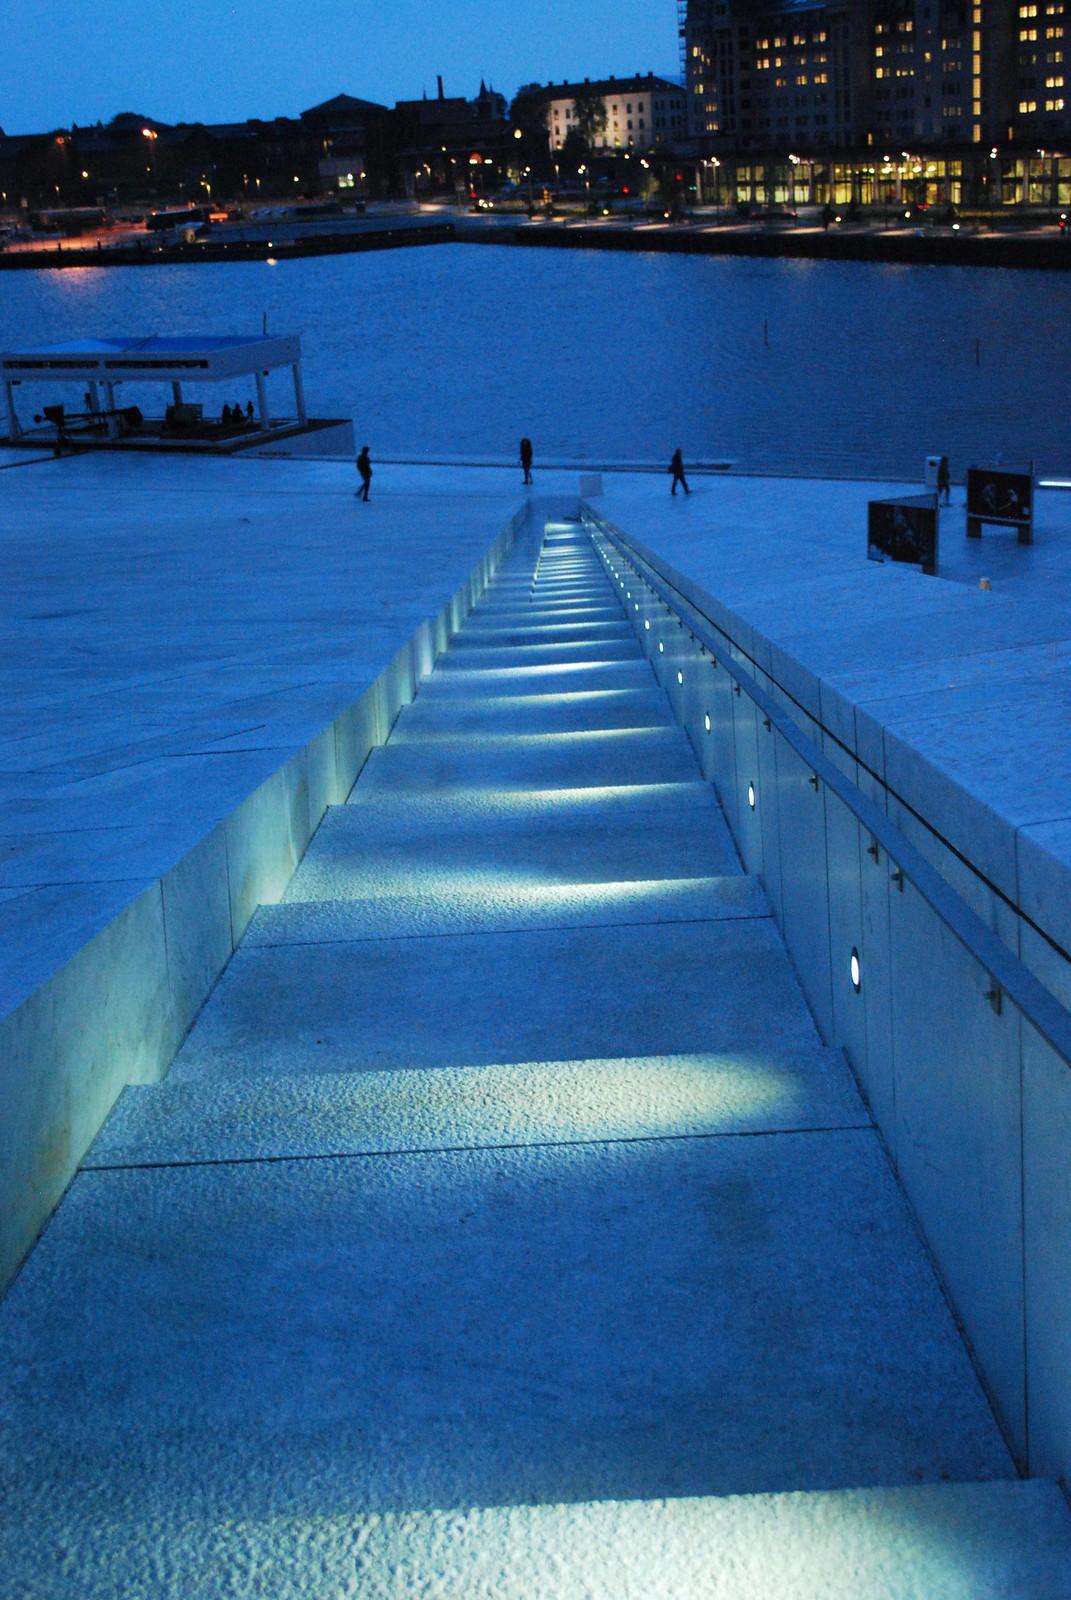 Oslo lit up at night